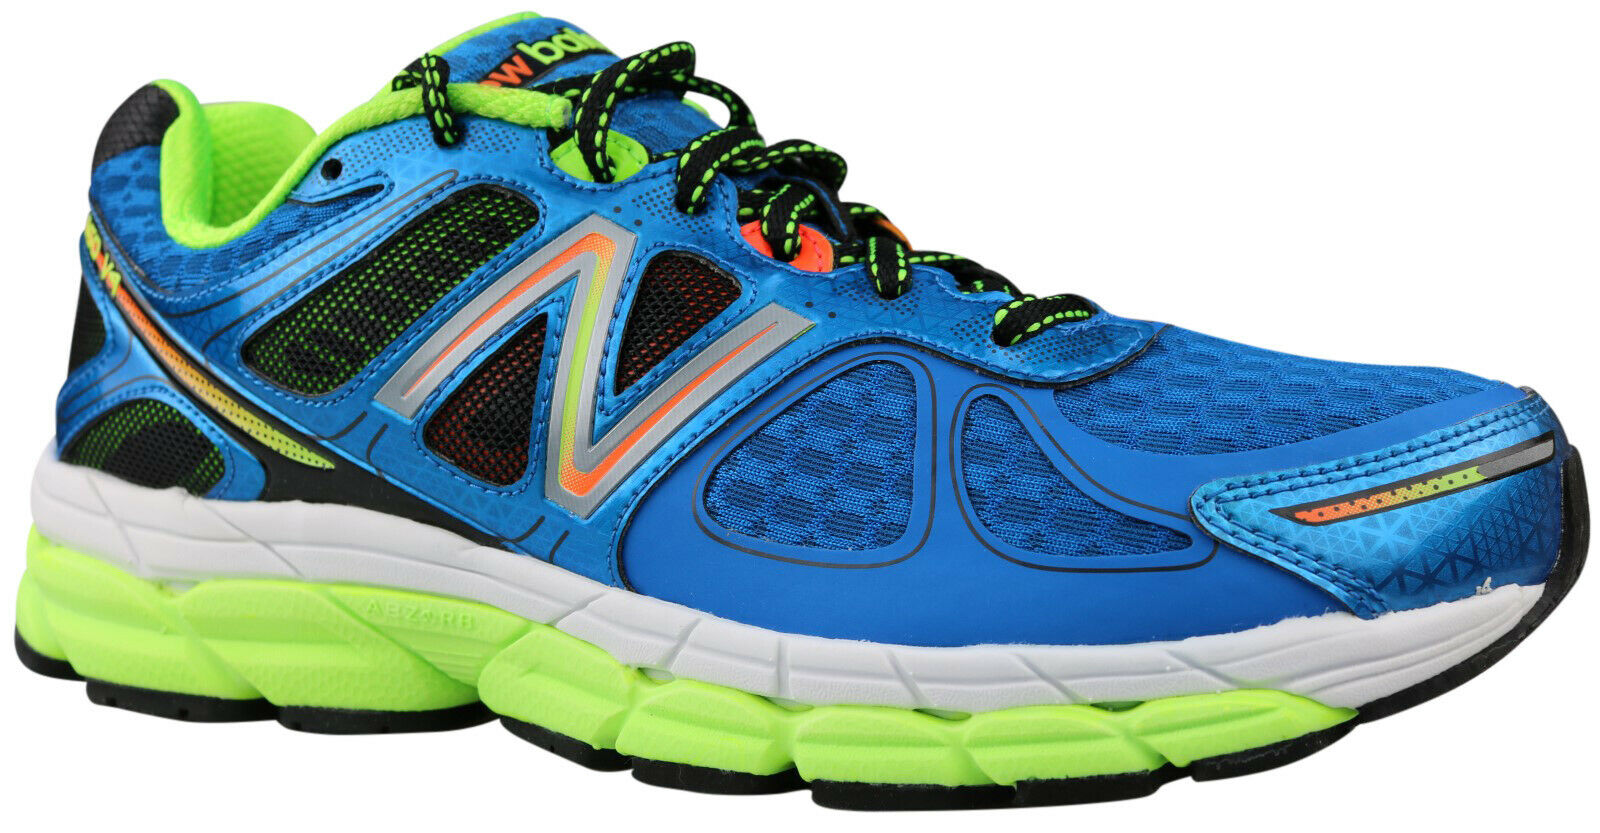 New balance m860 d v4 caballeros zapatillas running zapatos azul Gr. 40 - 42,5 nuevo